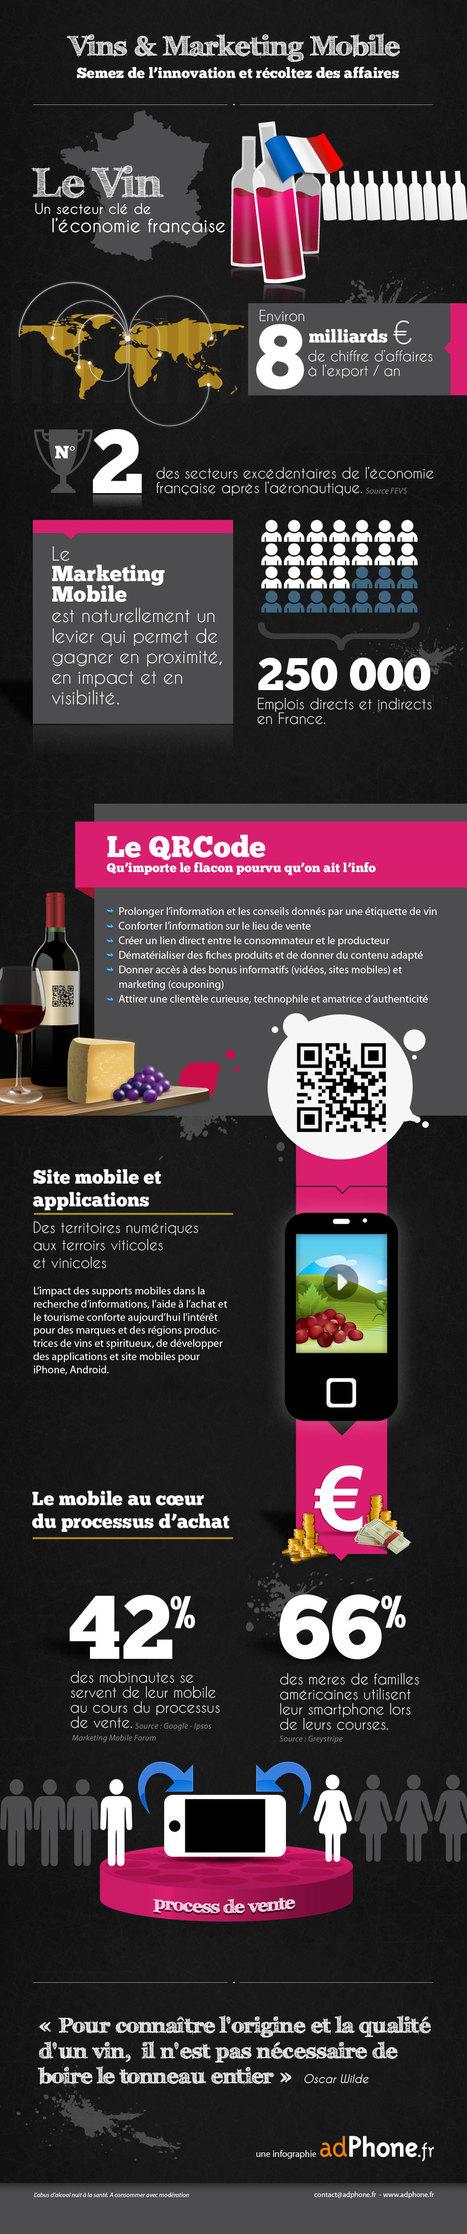 Vins, spiritueux et marketing mobile : l'infographie adPhone – adPhone – Mobile marketing agency | Tag 2D & Vins | Scoop.it